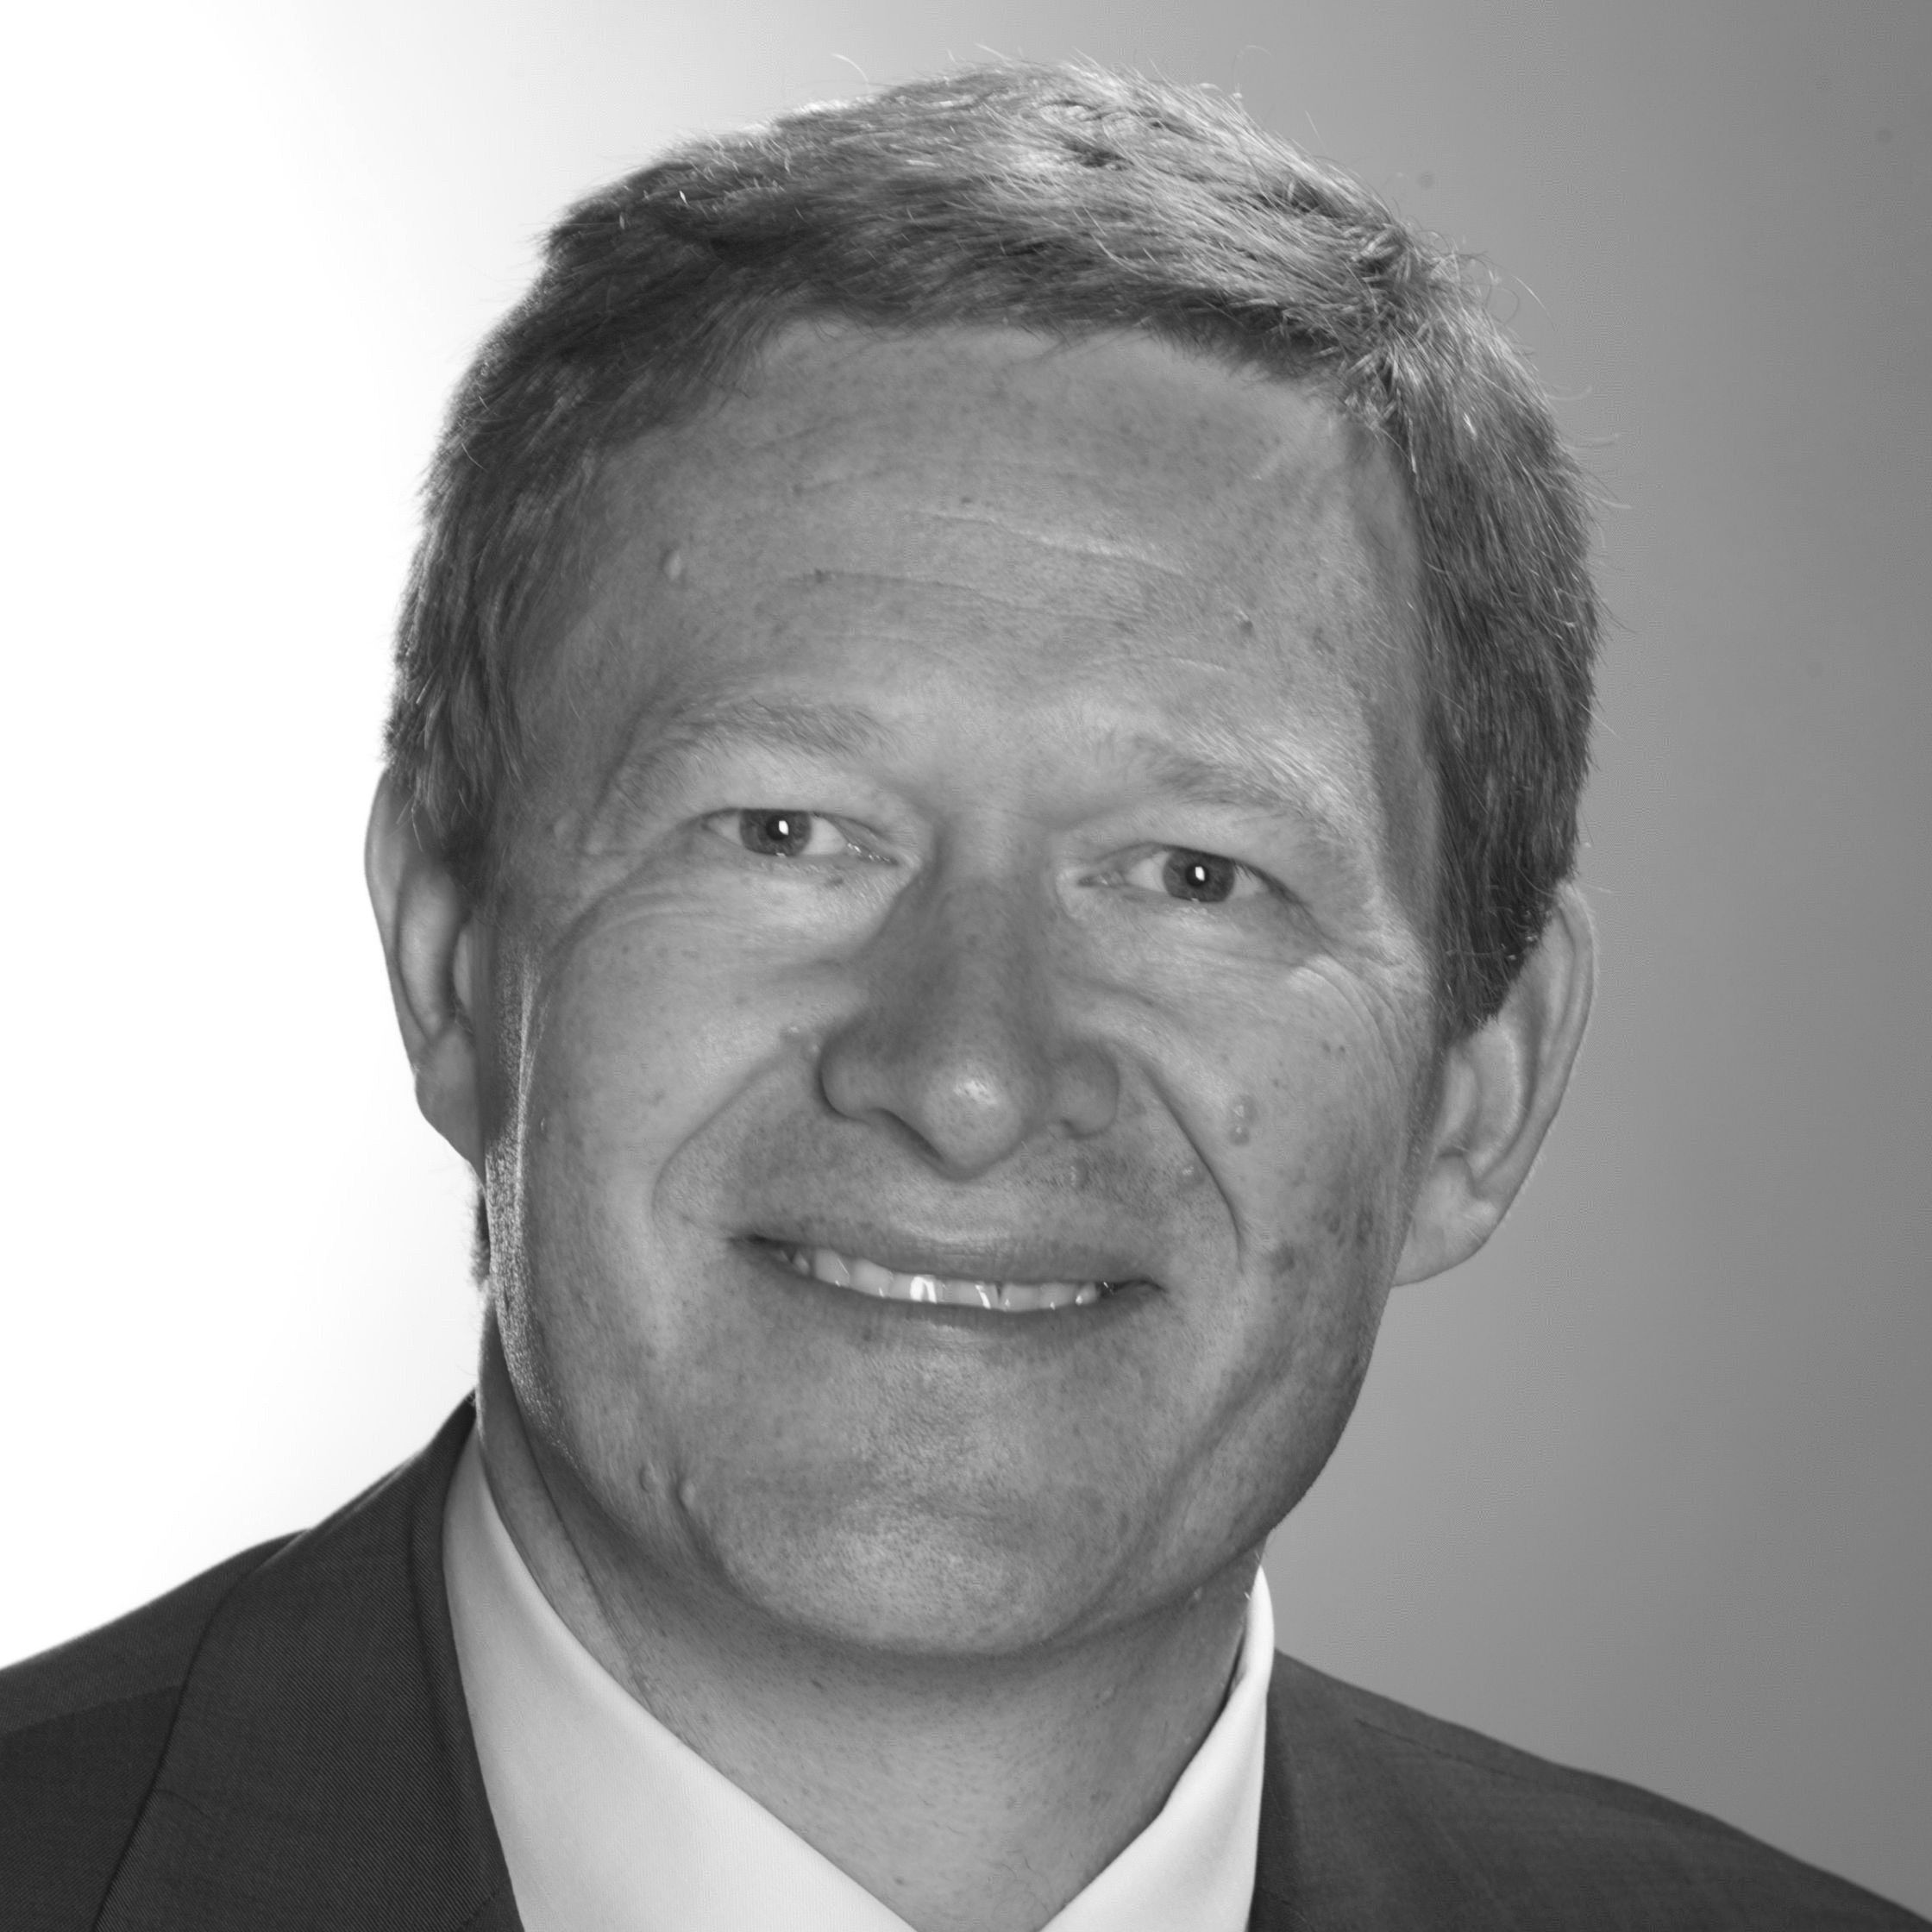 Niels B. Christiansen